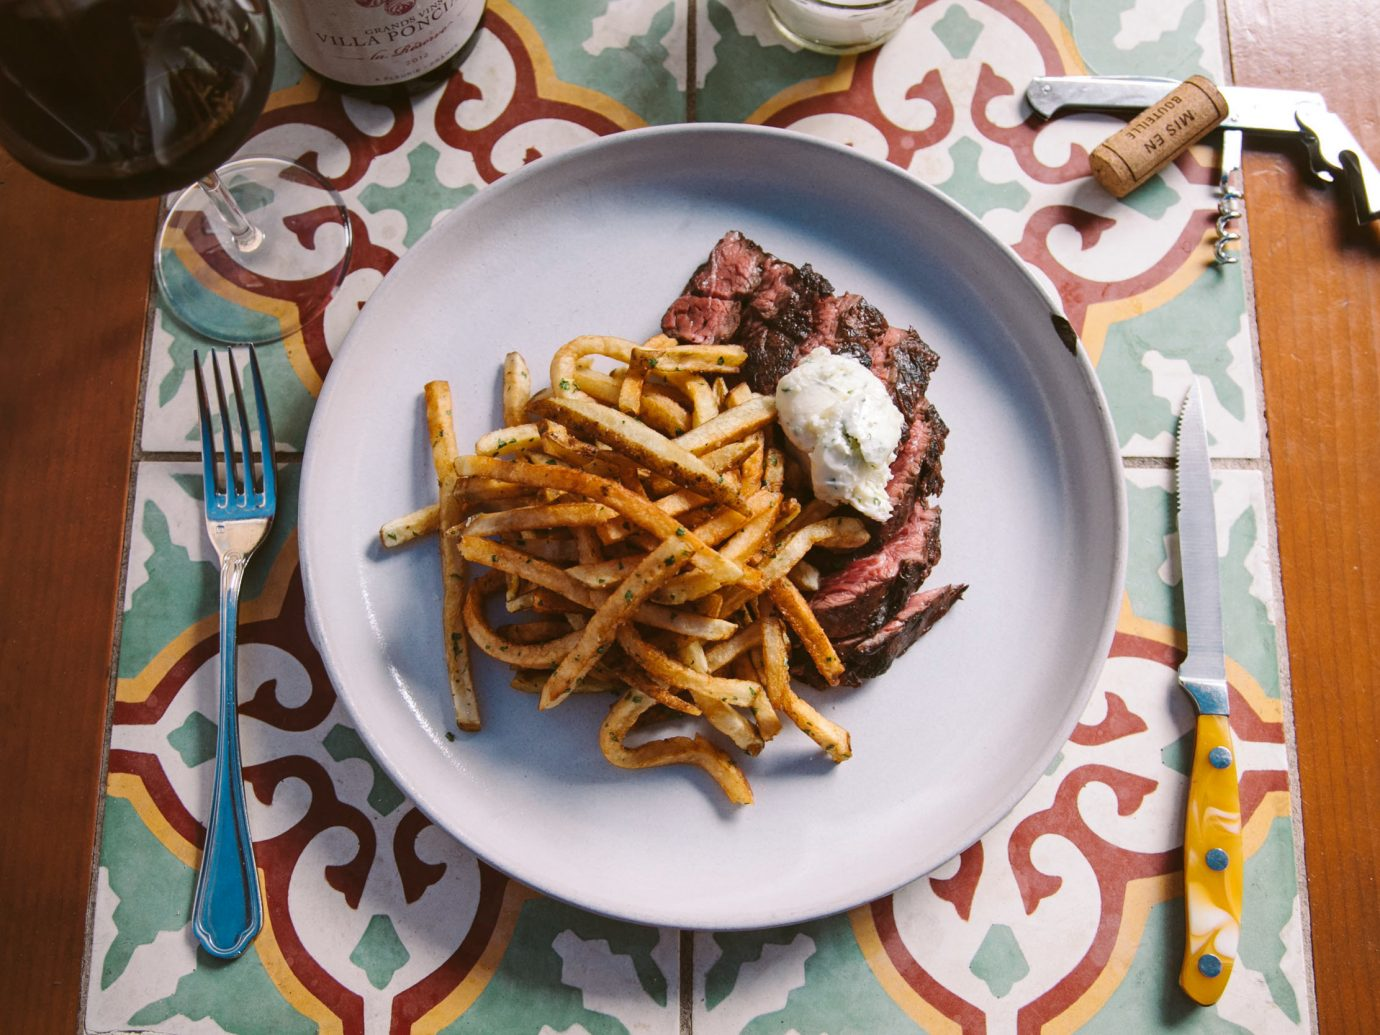 Romance Trip Ideas table plate food dish cuisine produce meal spaghetti meat breakfast vegetable